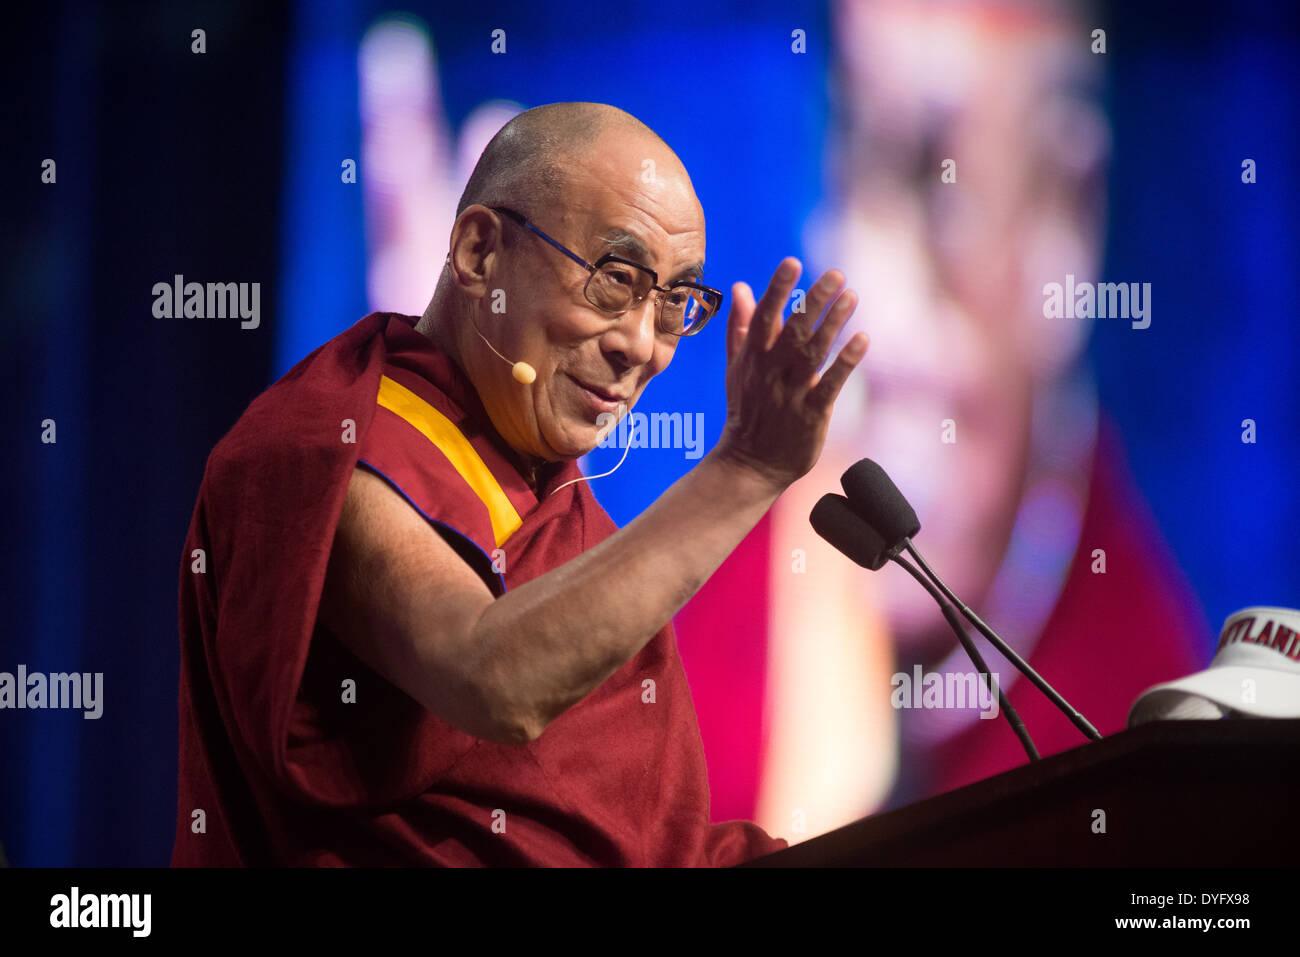 Dalai Lama Lectures at University of Maryland - Stock Image